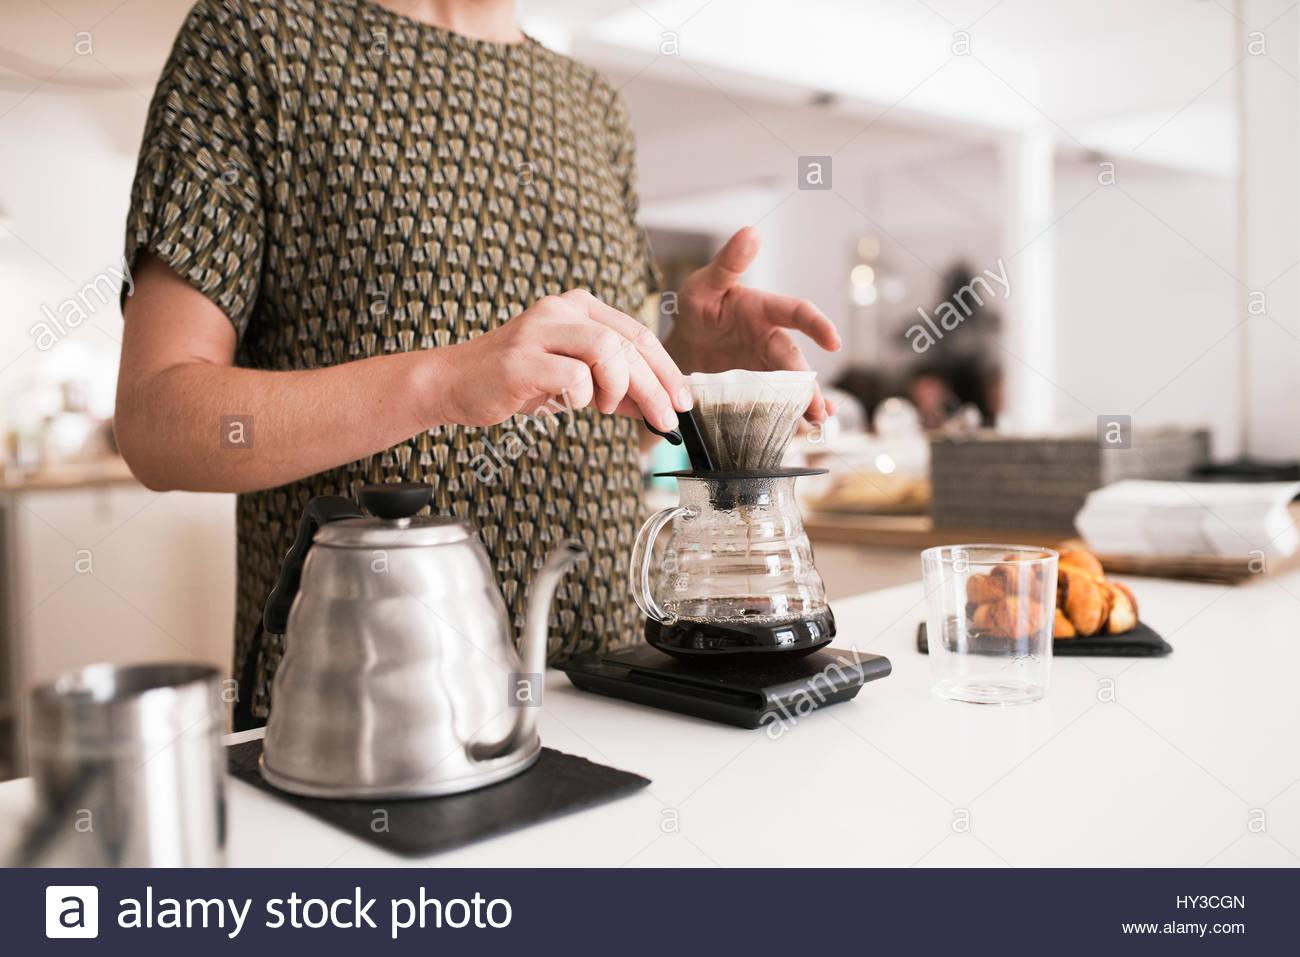 Portugal, Woman preparing coffee - Stock Image